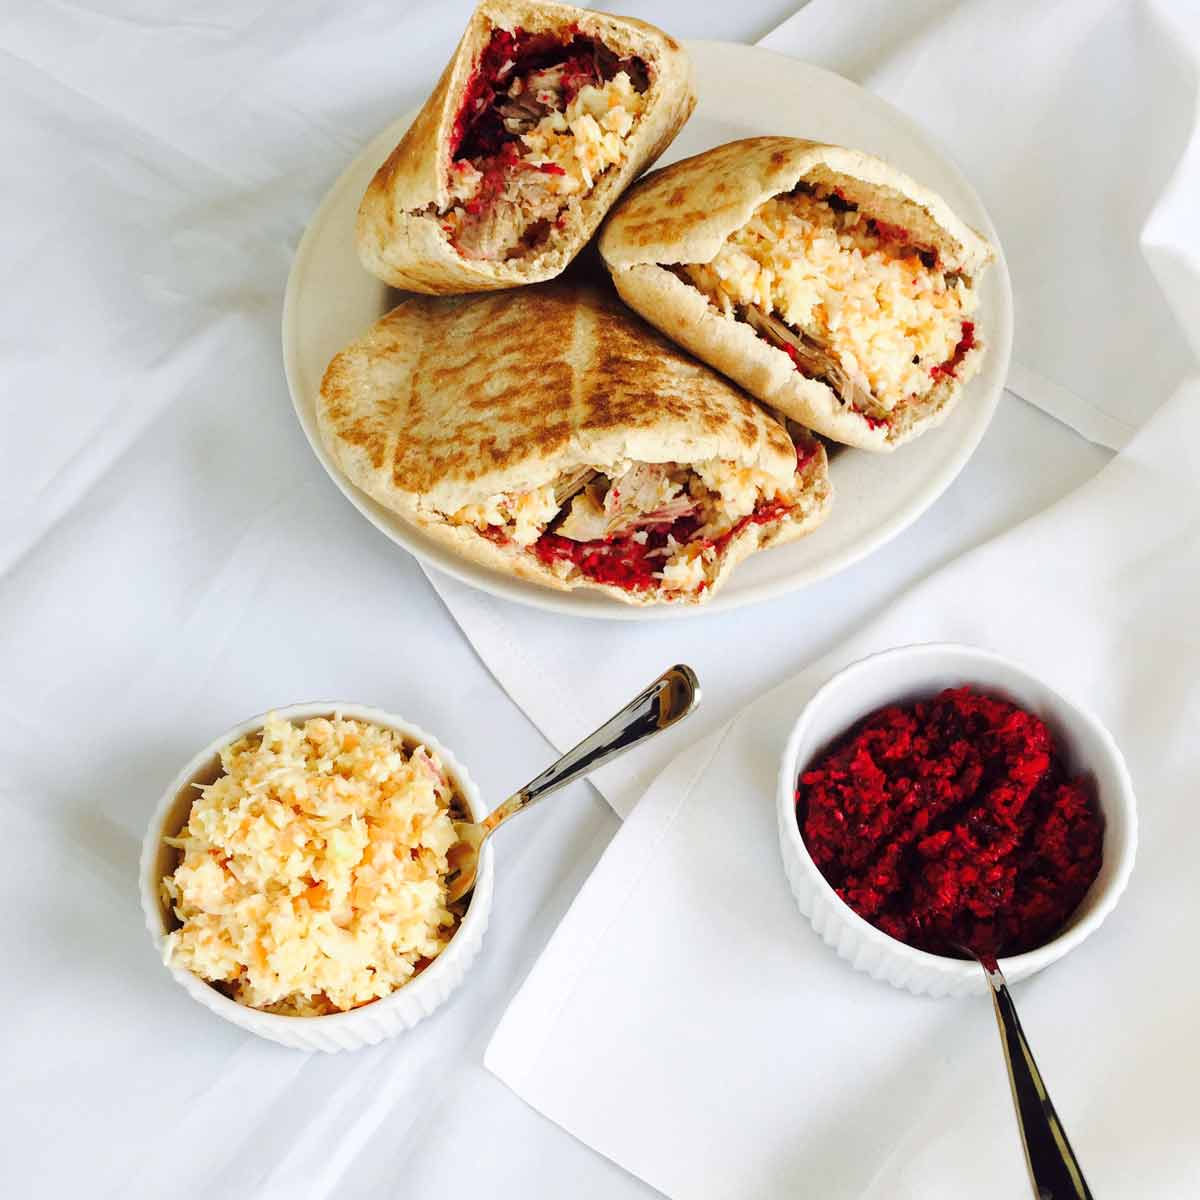 Three lamb pita pockets (sandwiches), alongside bowls of coleslaw and horseradish sauce